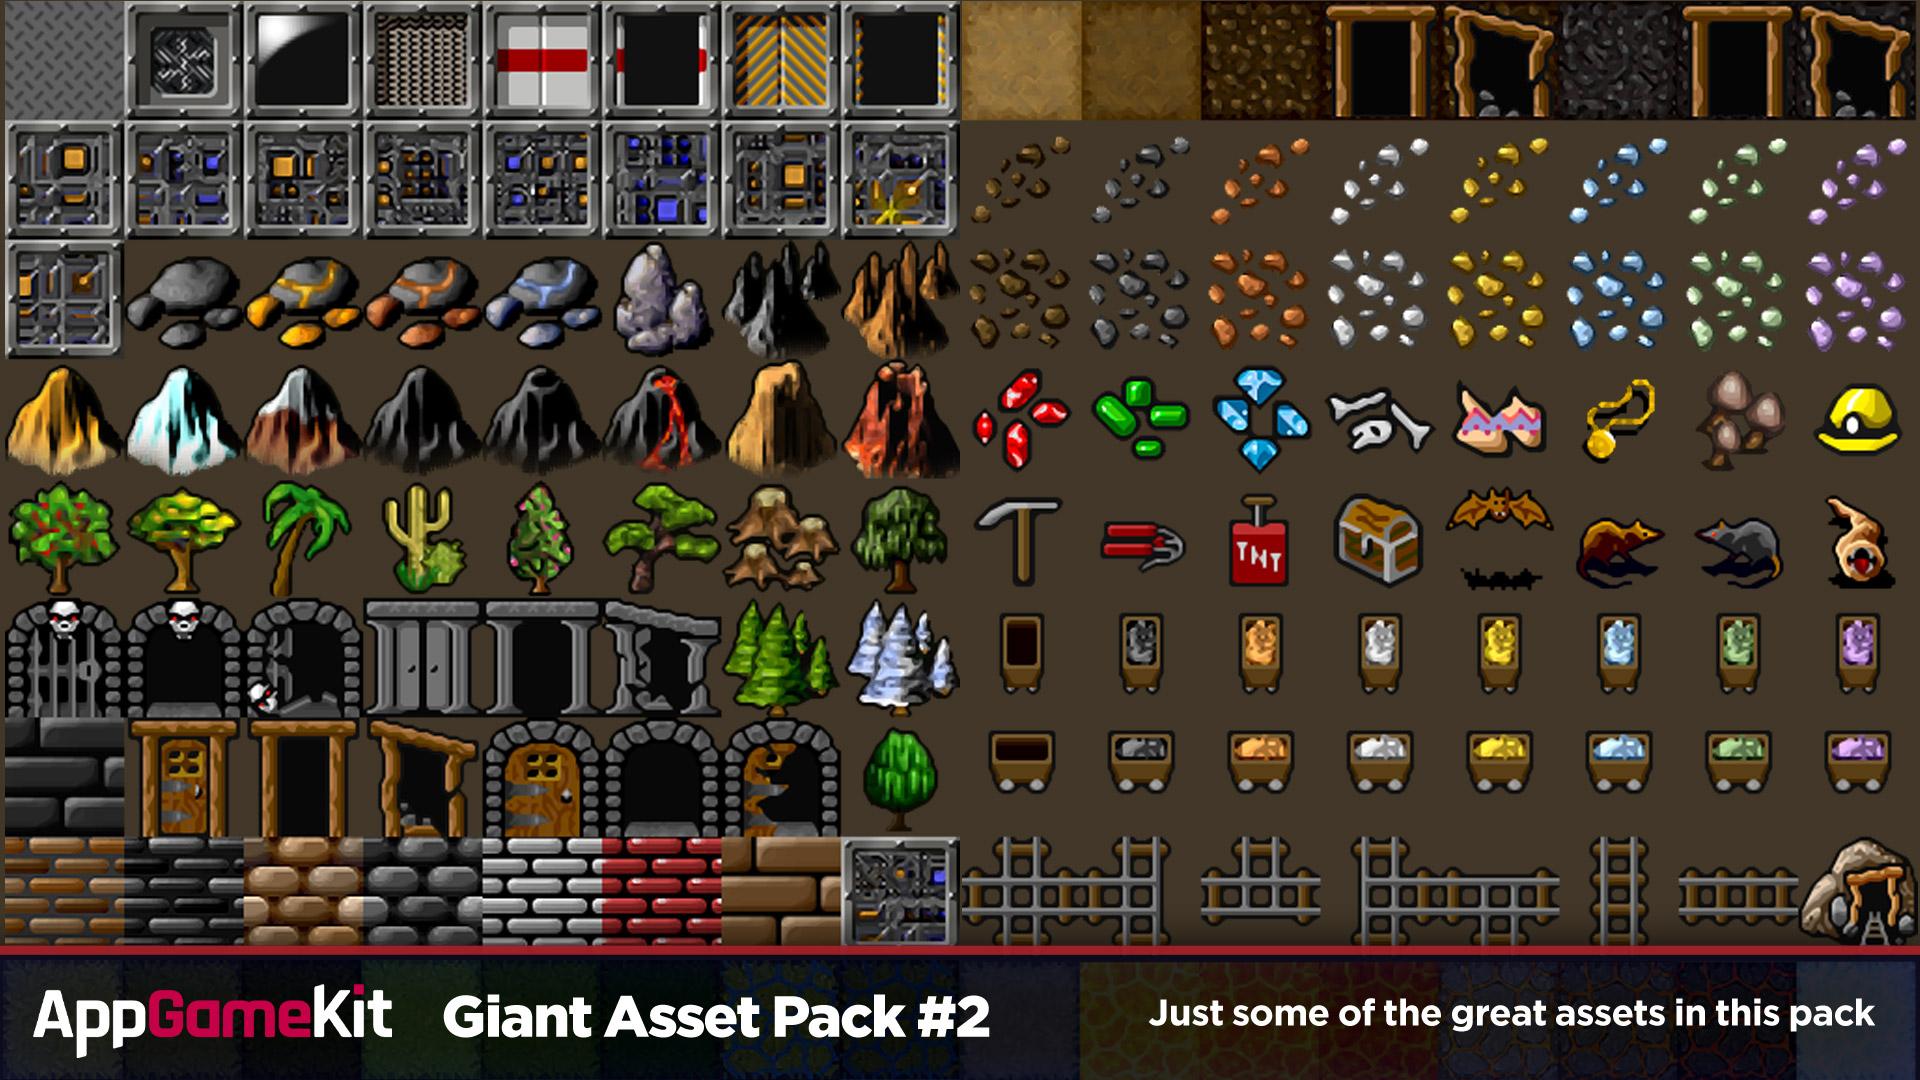 AppGameKit - Giant Asset Pack 2 screenshot